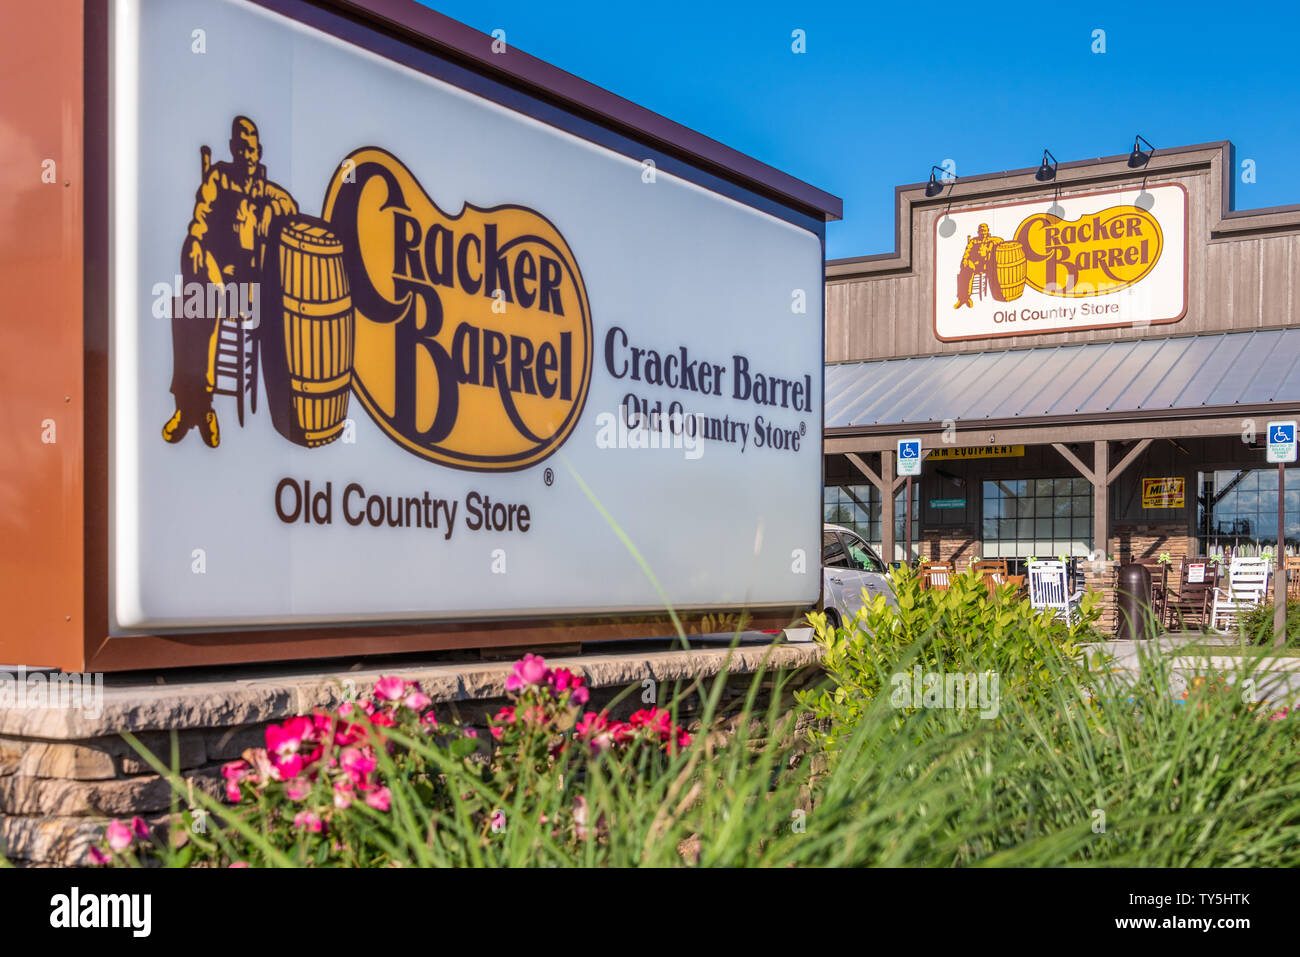 Cracker Barrel Old Country Store restaurant à Zagreb, en Géorgie. (USA) Banque D'Images